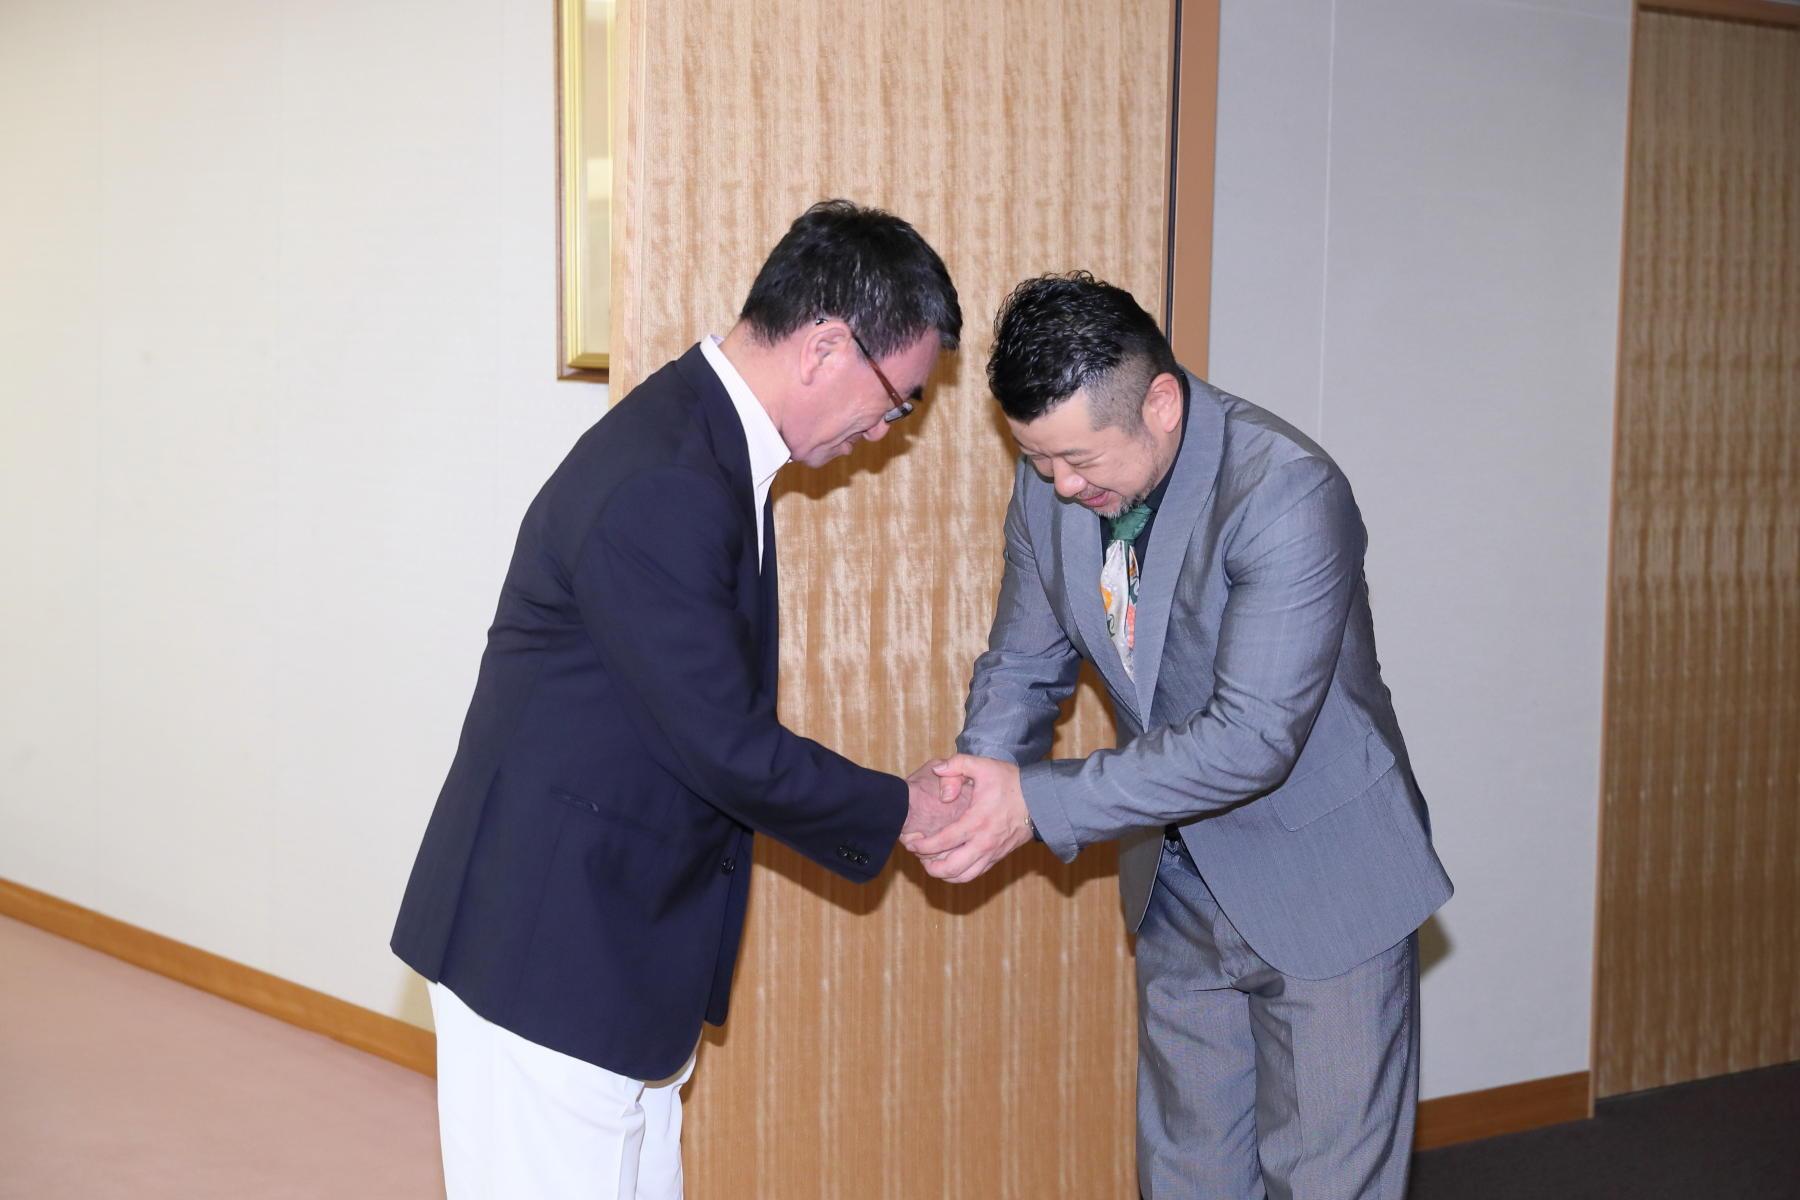 http://news.yoshimoto.co.jp/20180706231728-2ebaab83df260baf5c6207a90192e688366c48cd.jpg